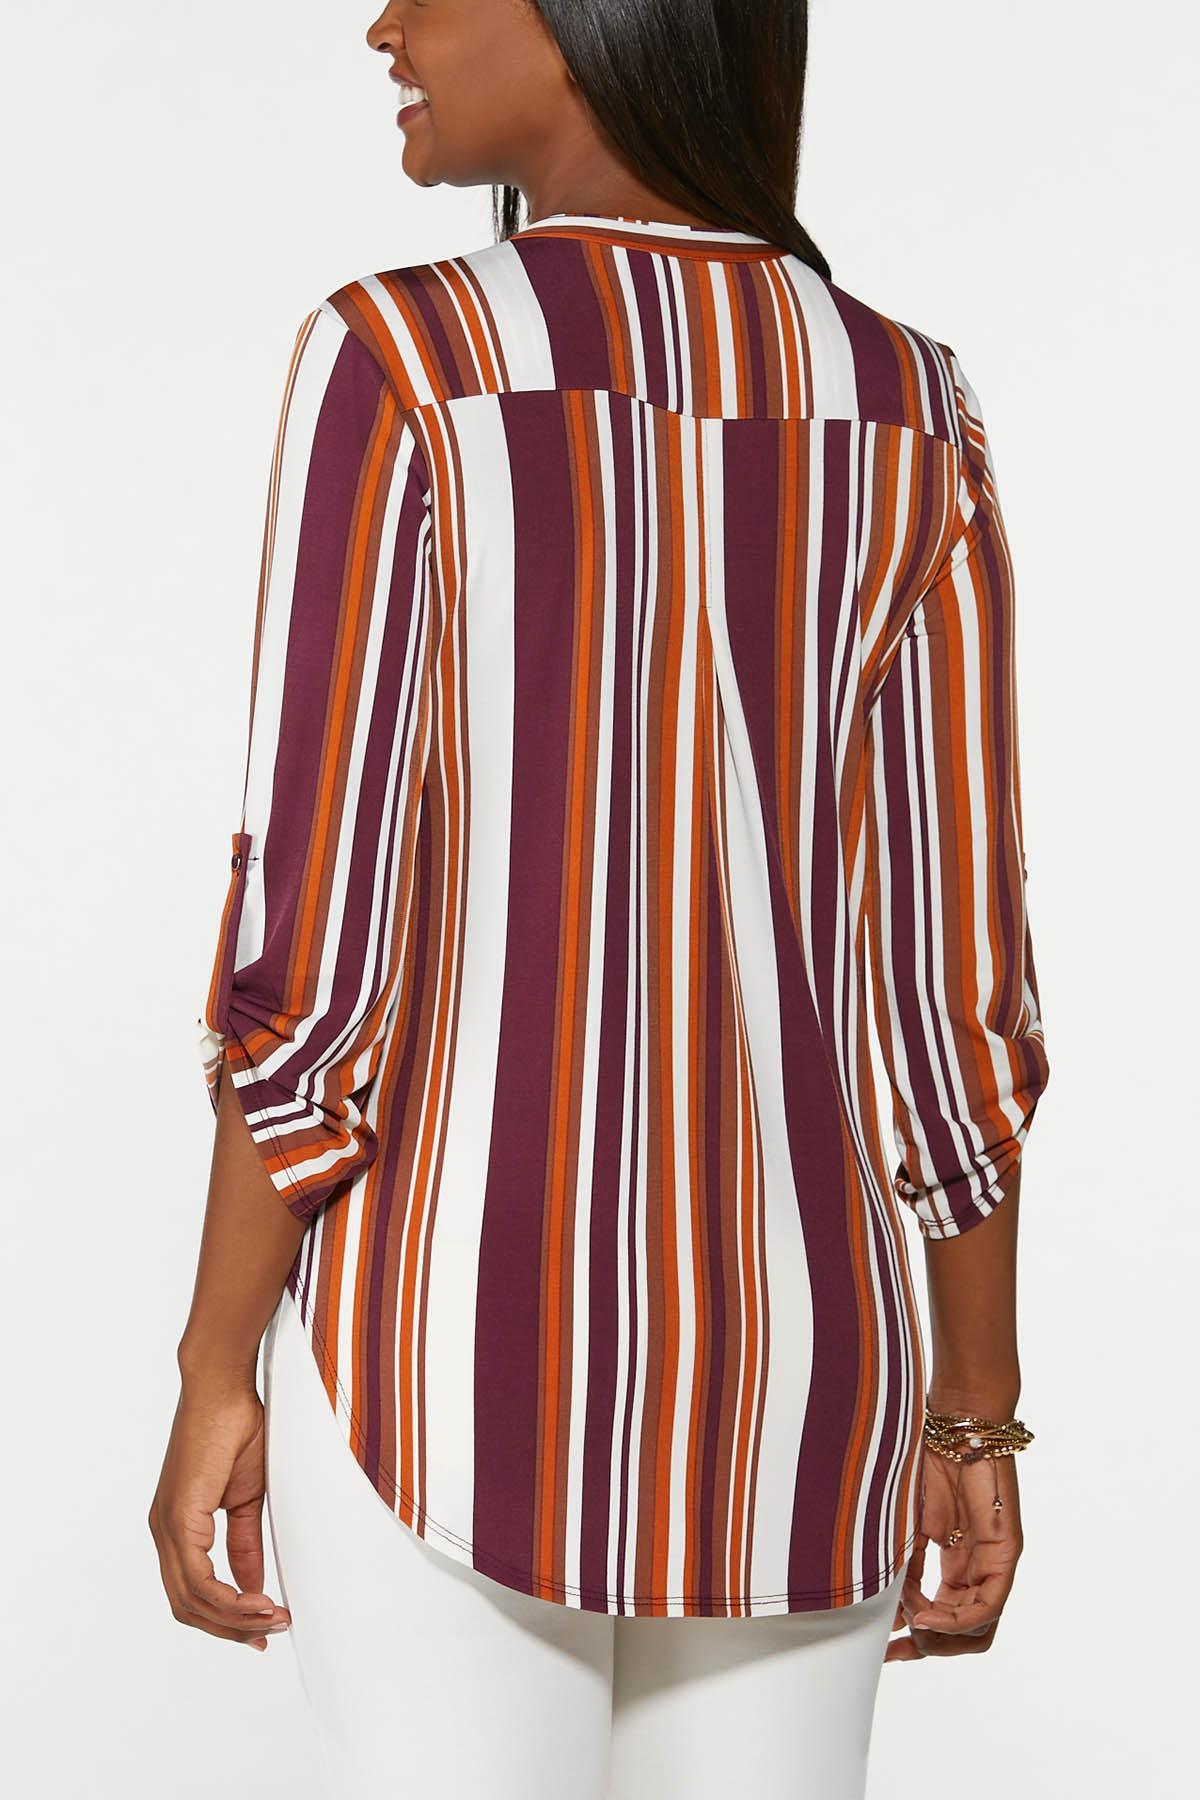 Caramel Apple Stripe Top (Item #44705638)